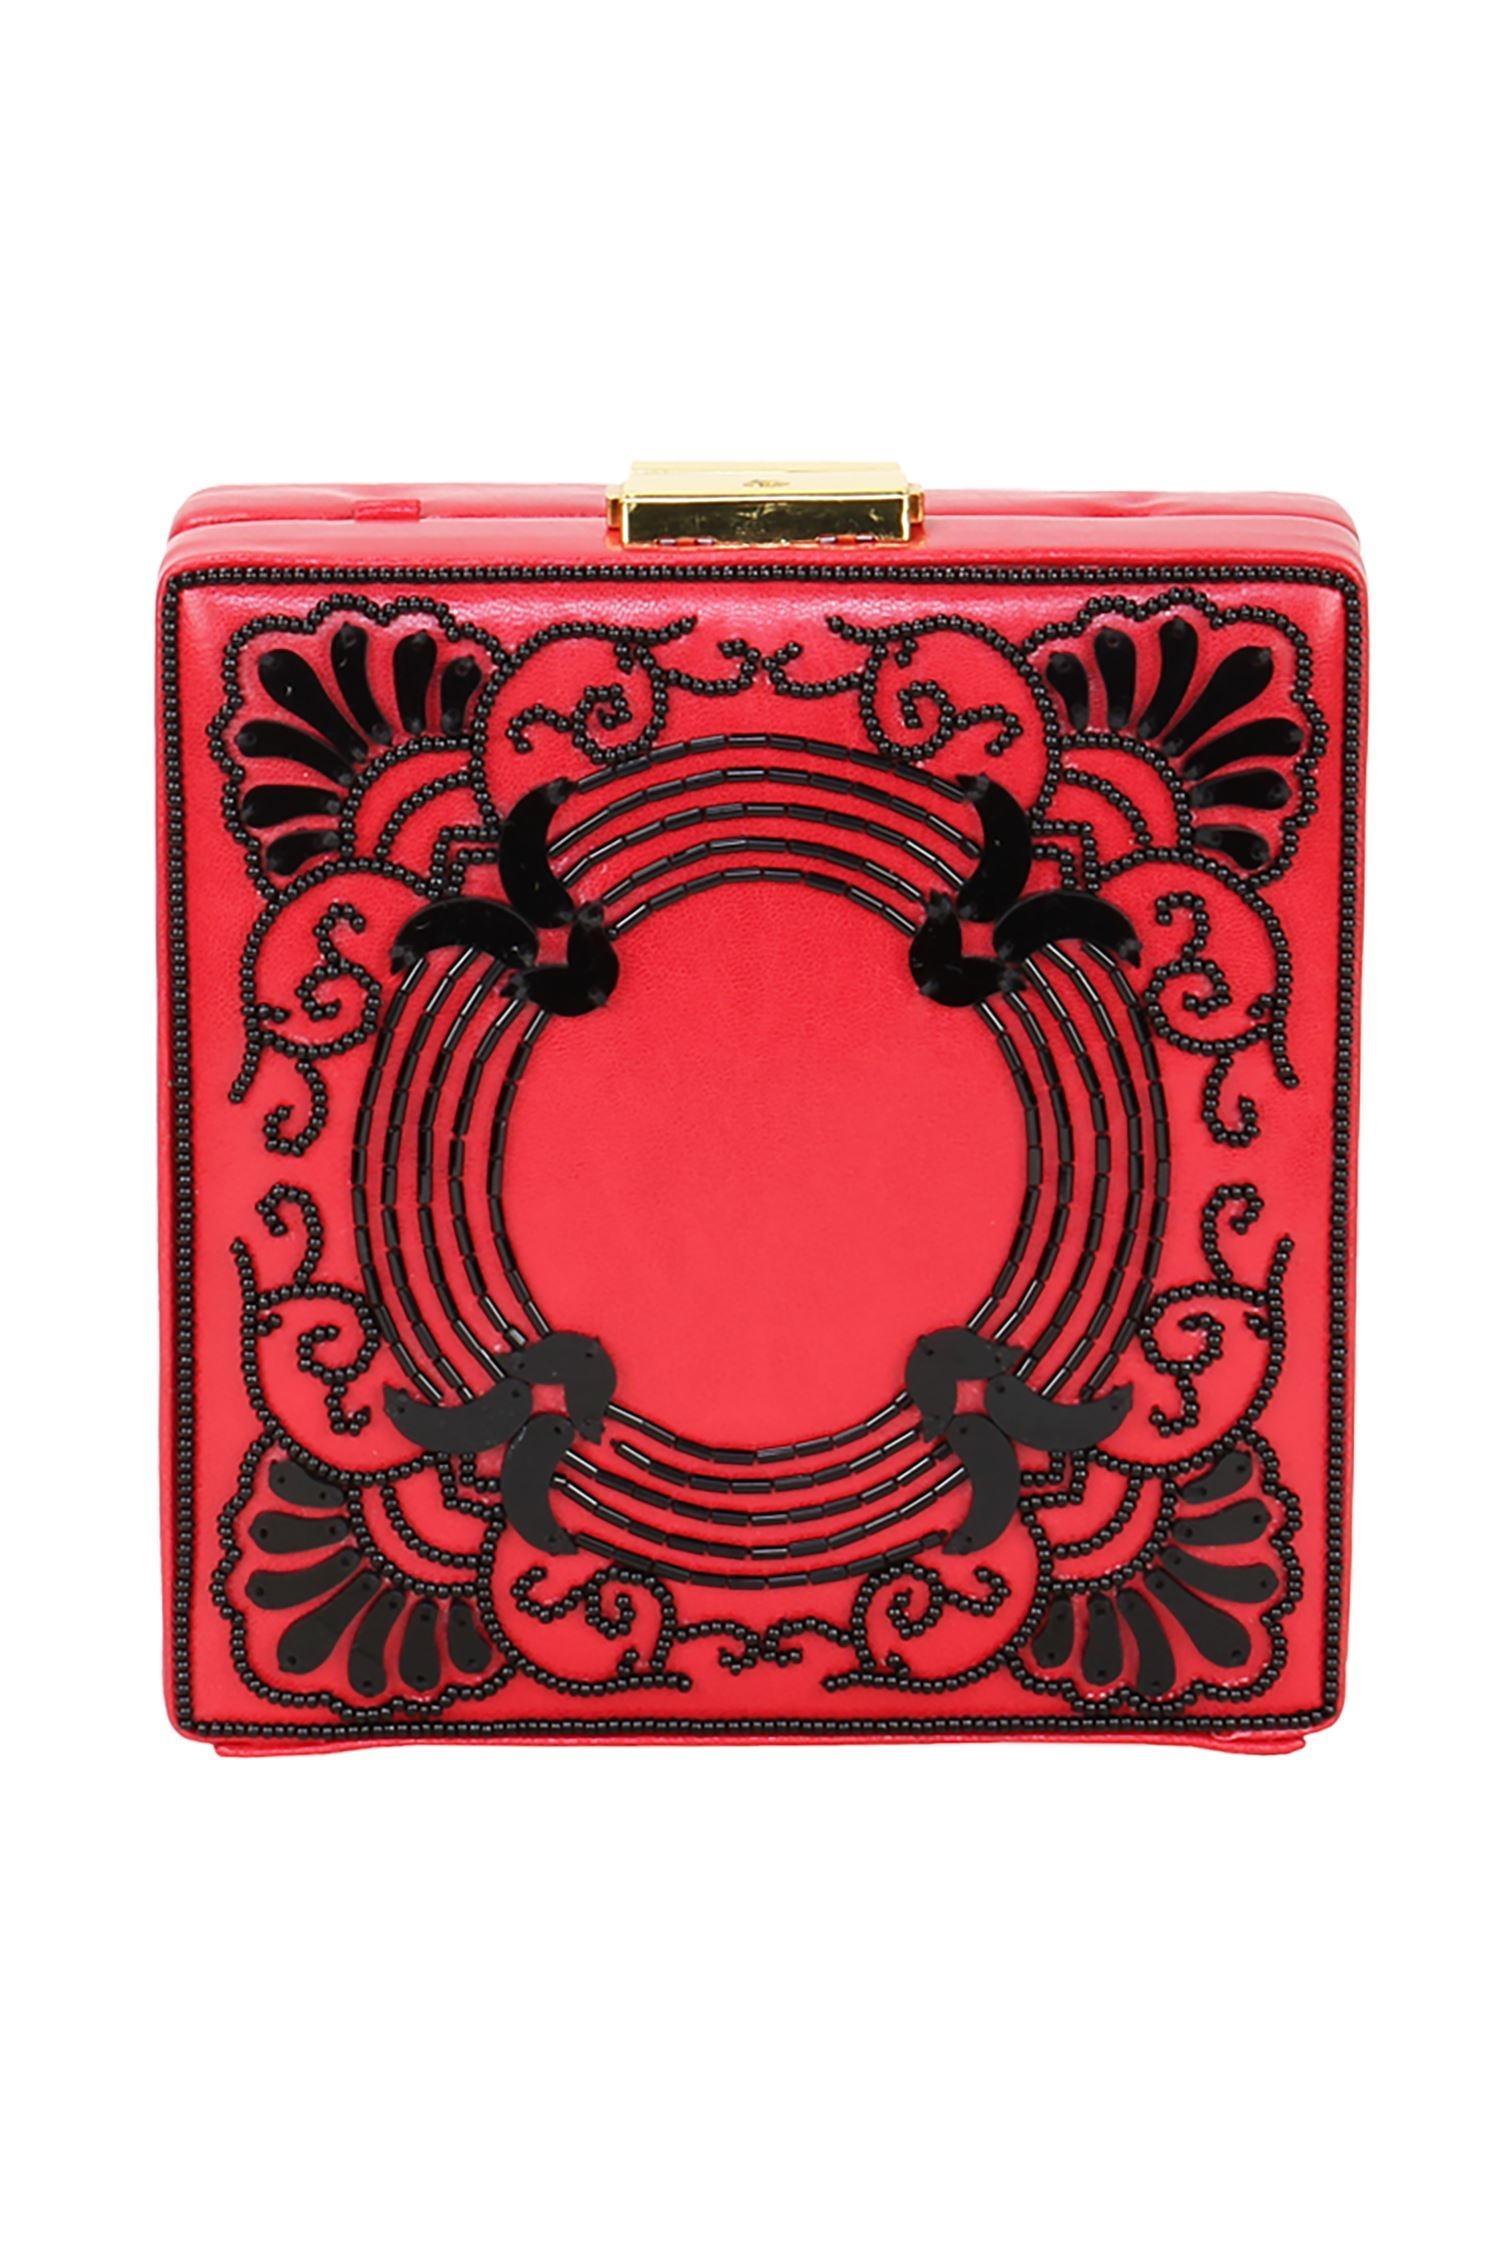 RossoyukiRed & black japanese beadwork embellished clutch